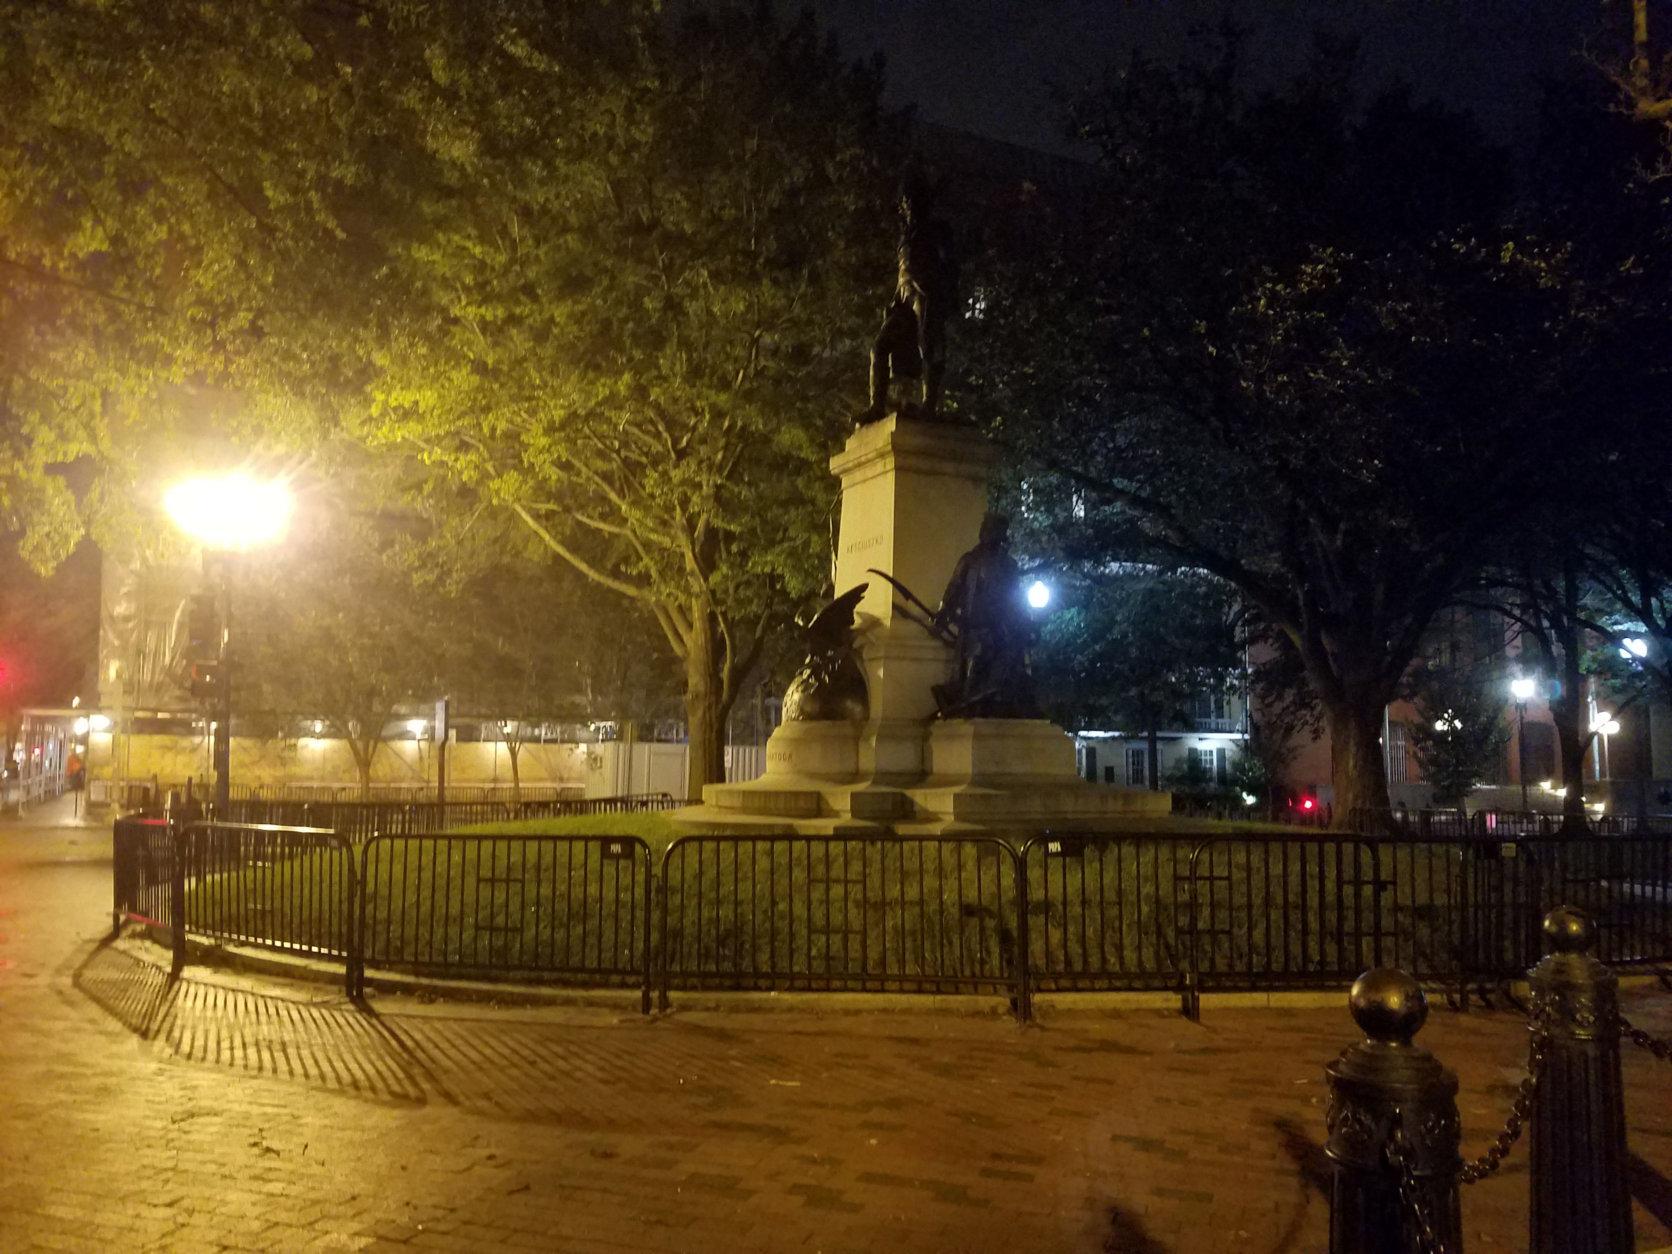 Lafayette Park after dark near the spot where Barton Keys was killed by Daniel Sickles. (WTOP/Will Vitka)